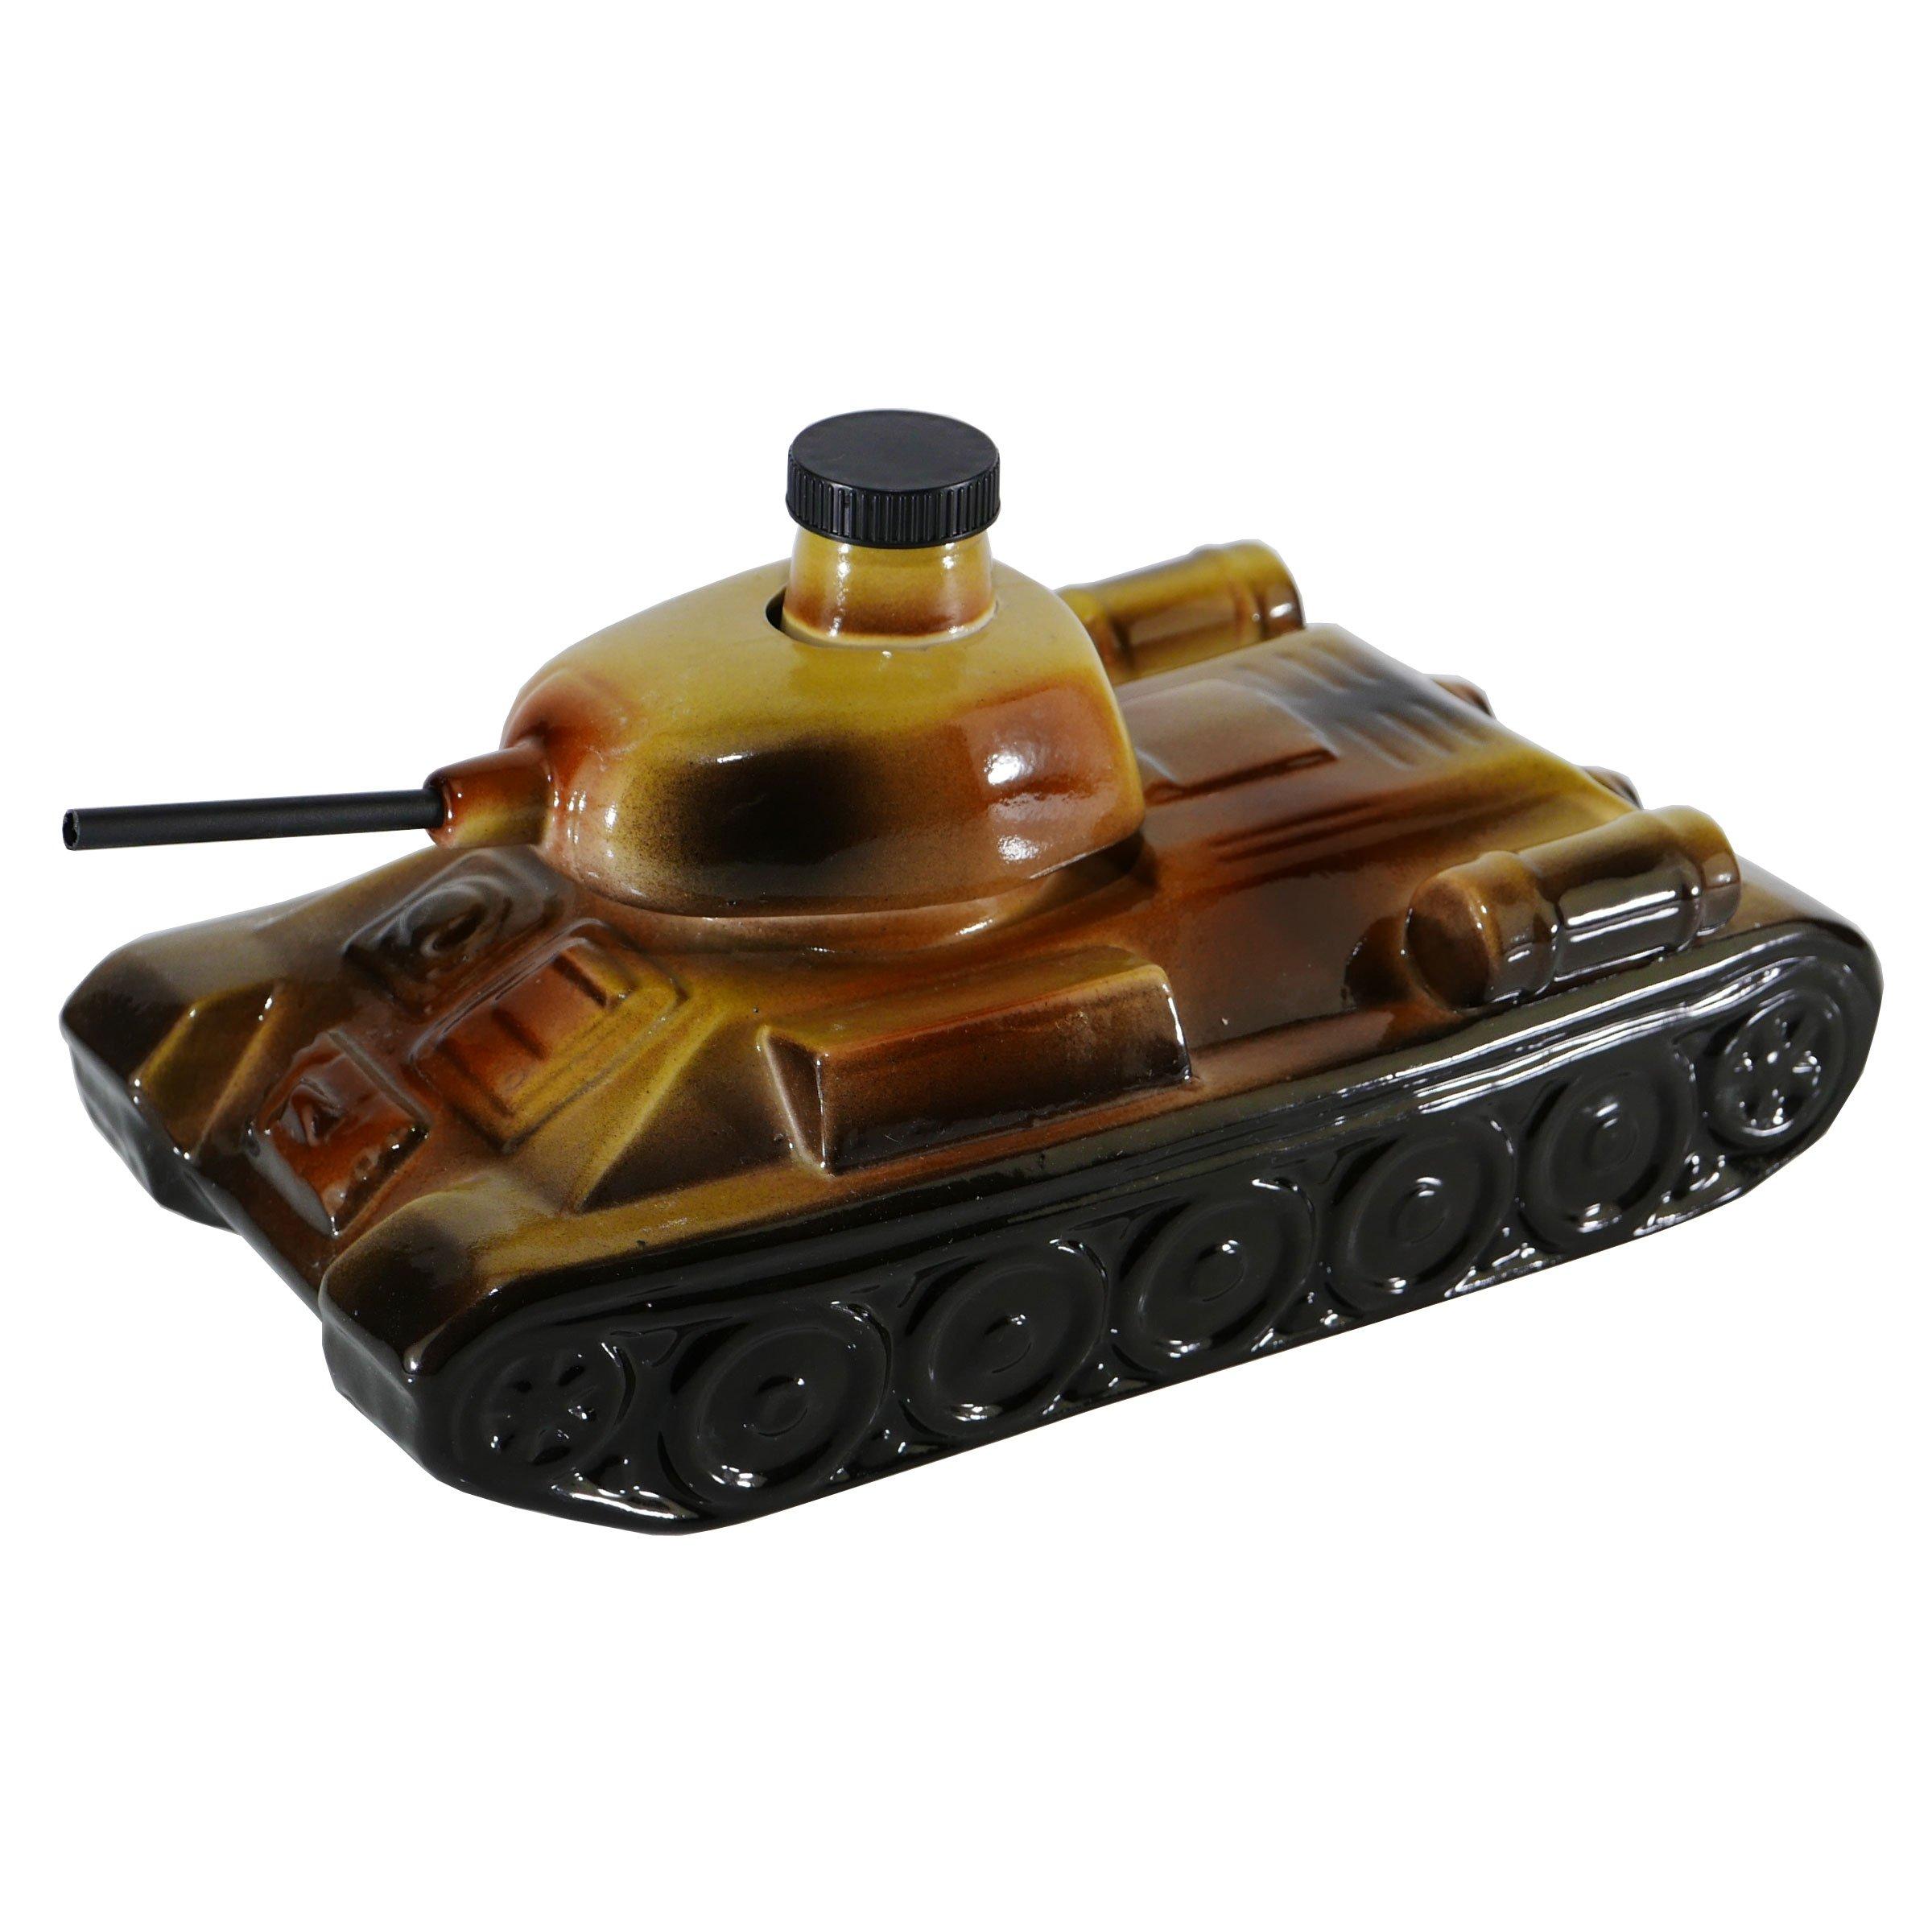 Vodka-Zlatogor-Panzer-1L-Wodka-Geschenkset-Tank-Geschenkideen-Geschenke